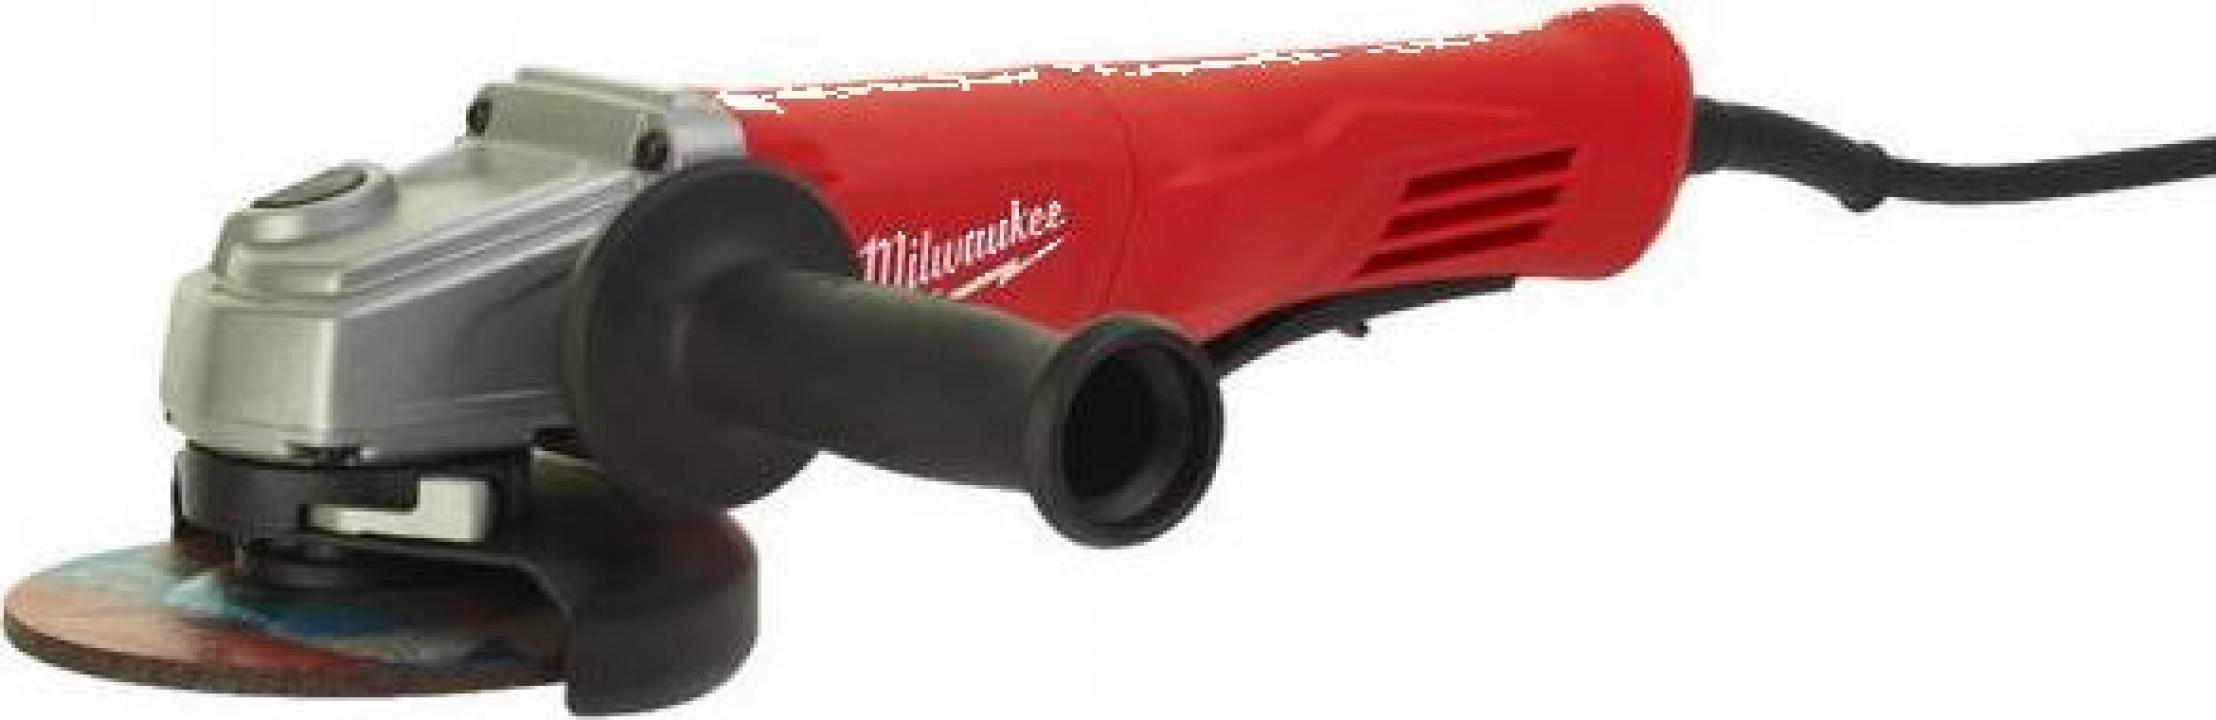 Polizor unghiular Milwaukee AG 13-125 XSPD, 1250 W, 125 mm